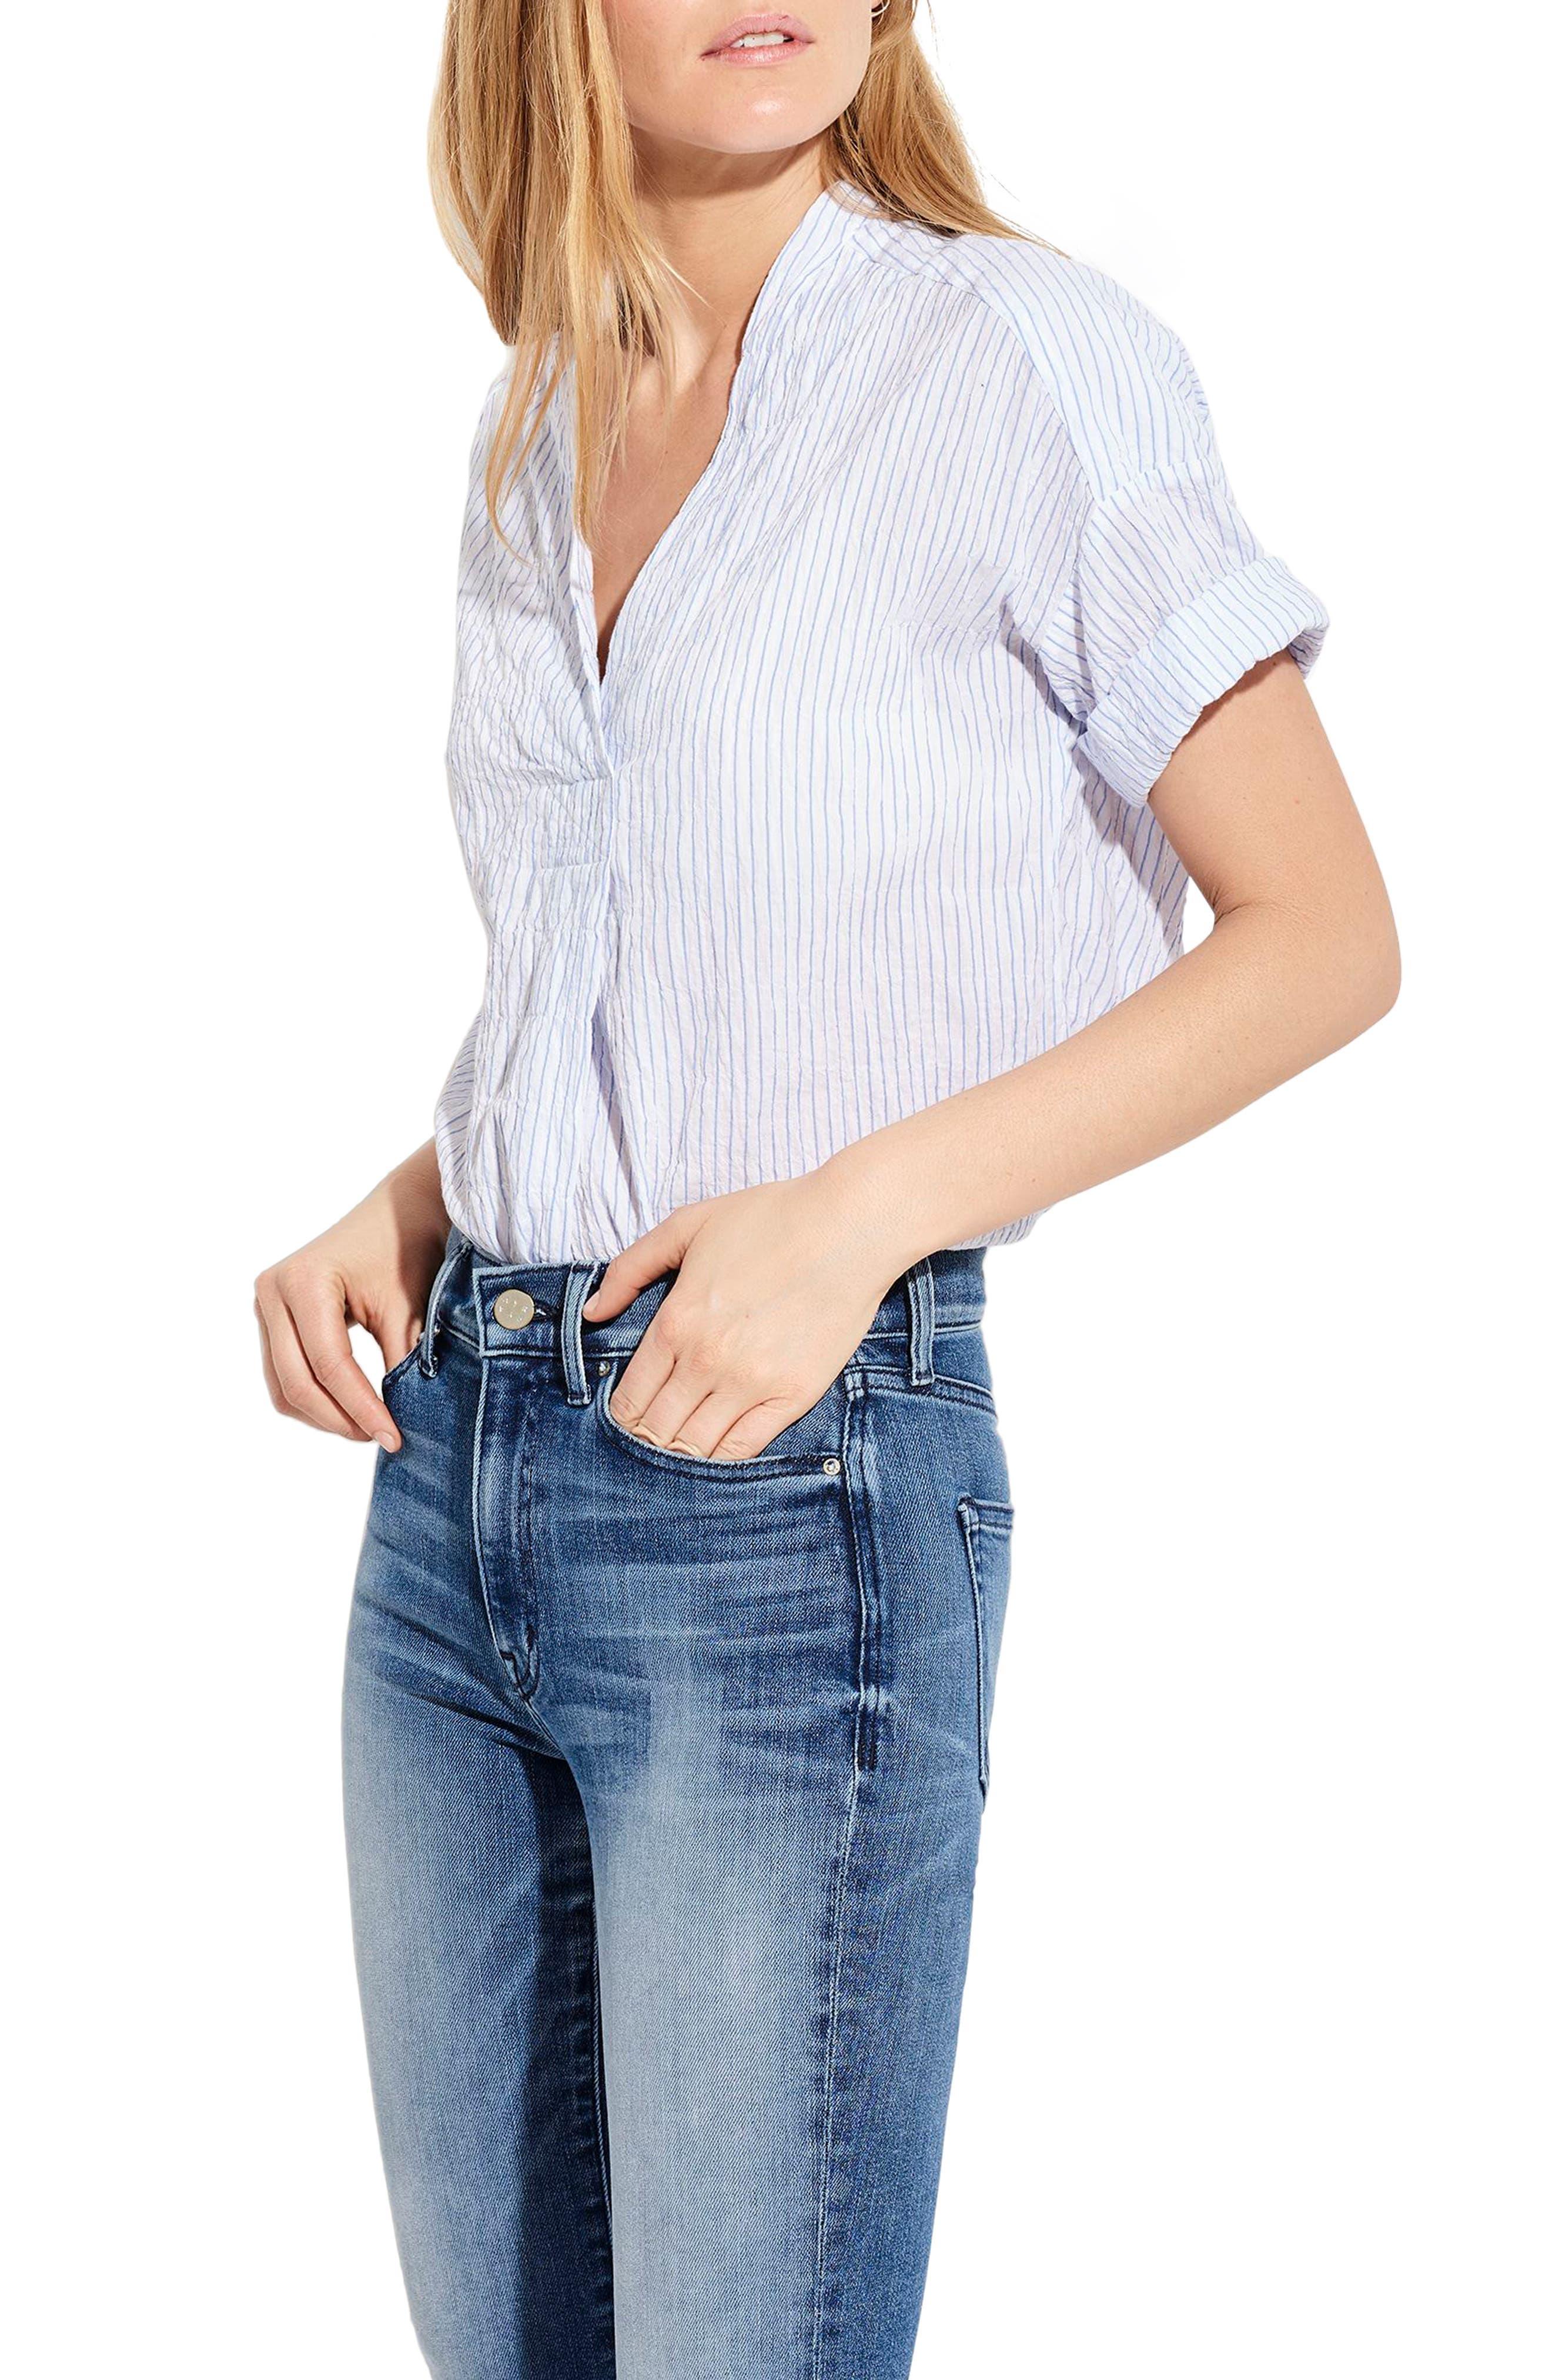 The Hero Shirt,                             Alternate thumbnail 3, color,                             Blue/ White Stripe